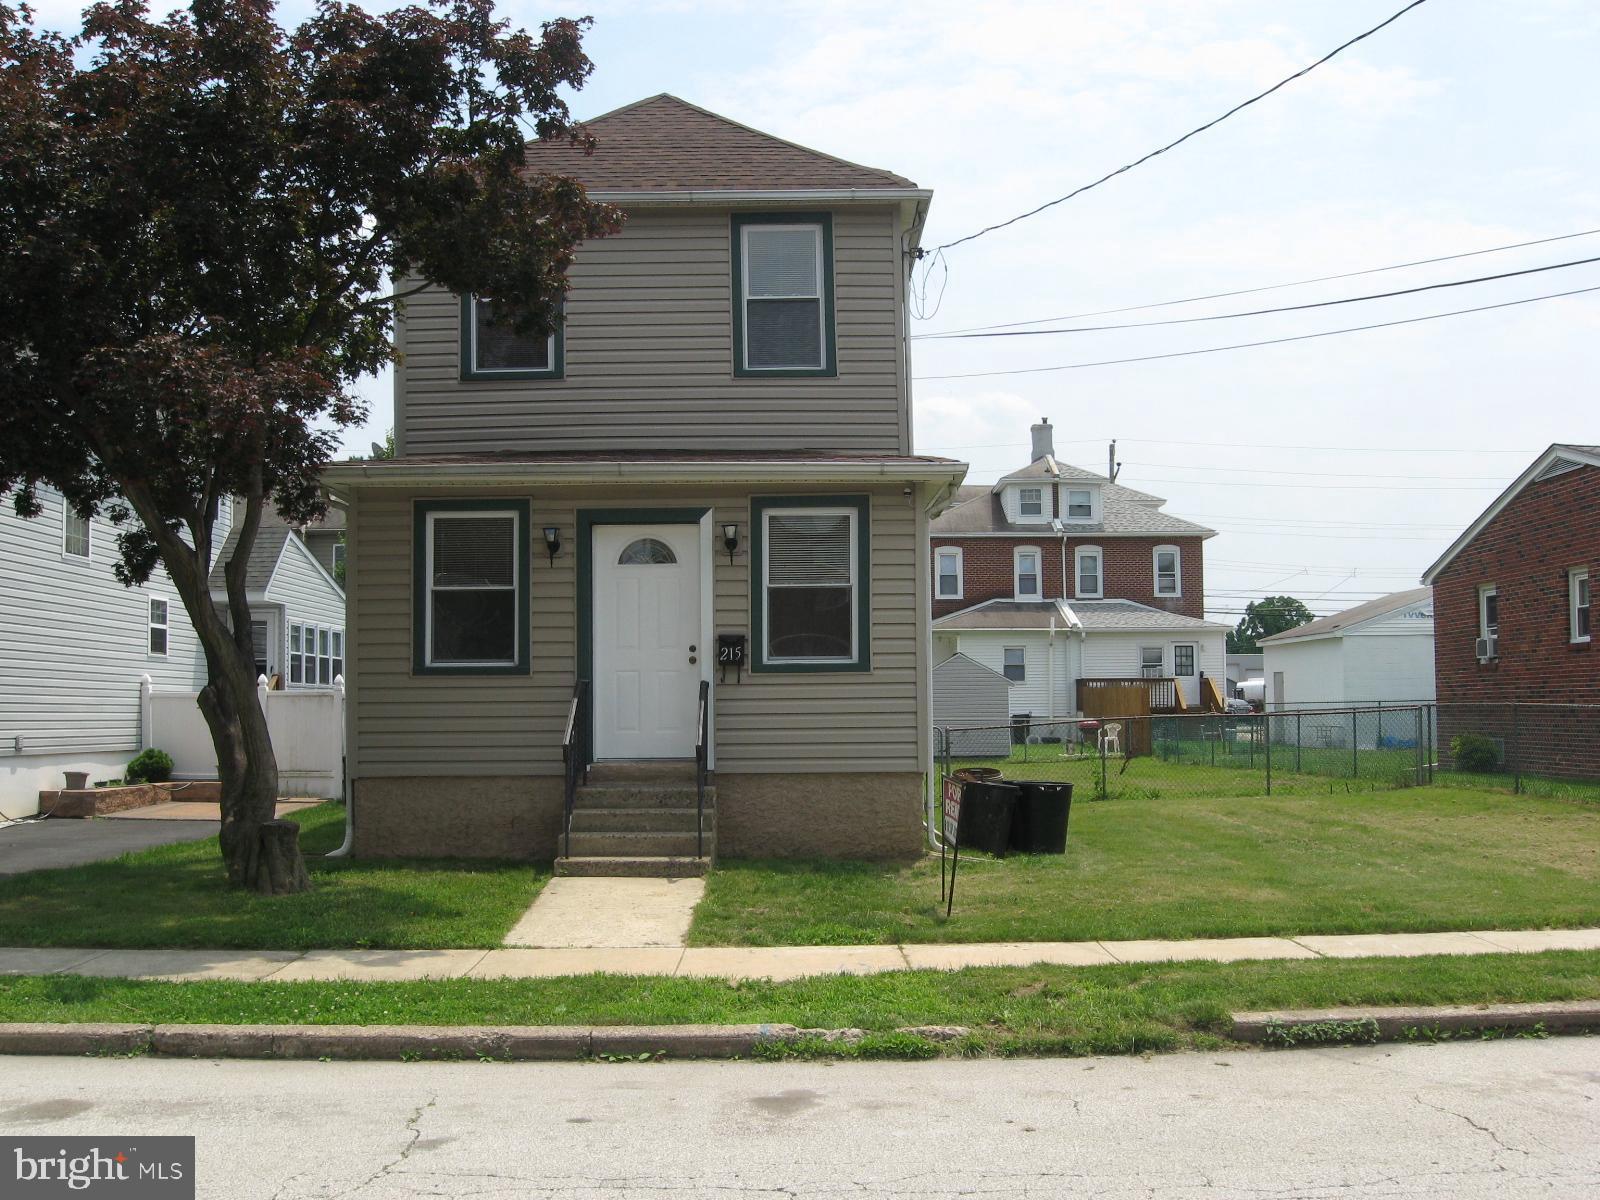 215 SENECA STREET, ESSINGTON, PA 19029